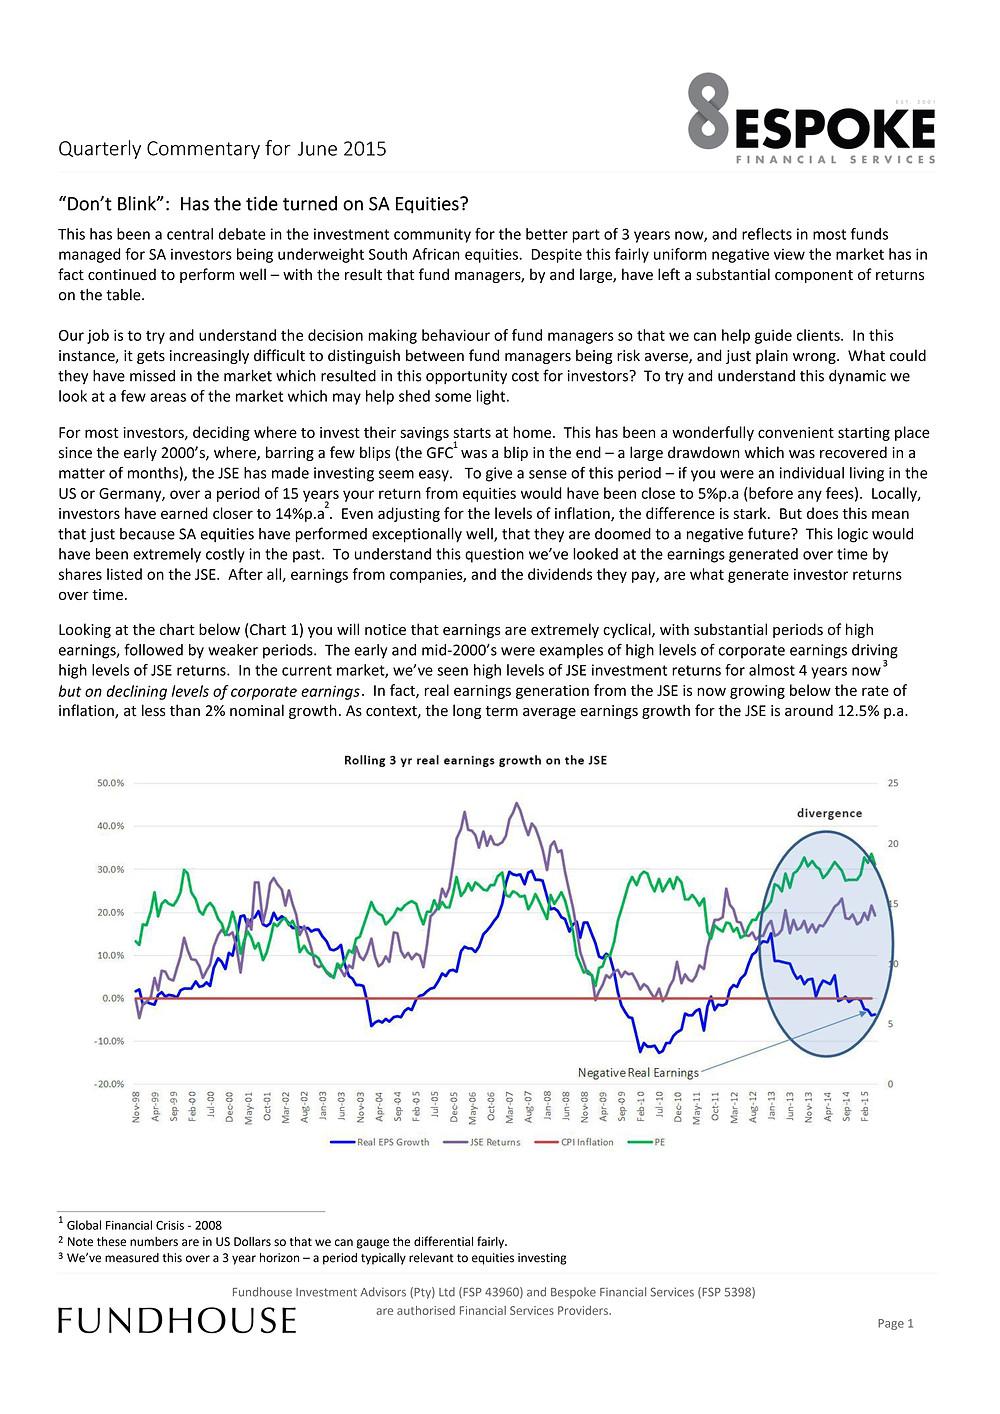 Bespoke Financial Services - Quarterly Commentary - June 2015_1.jpg